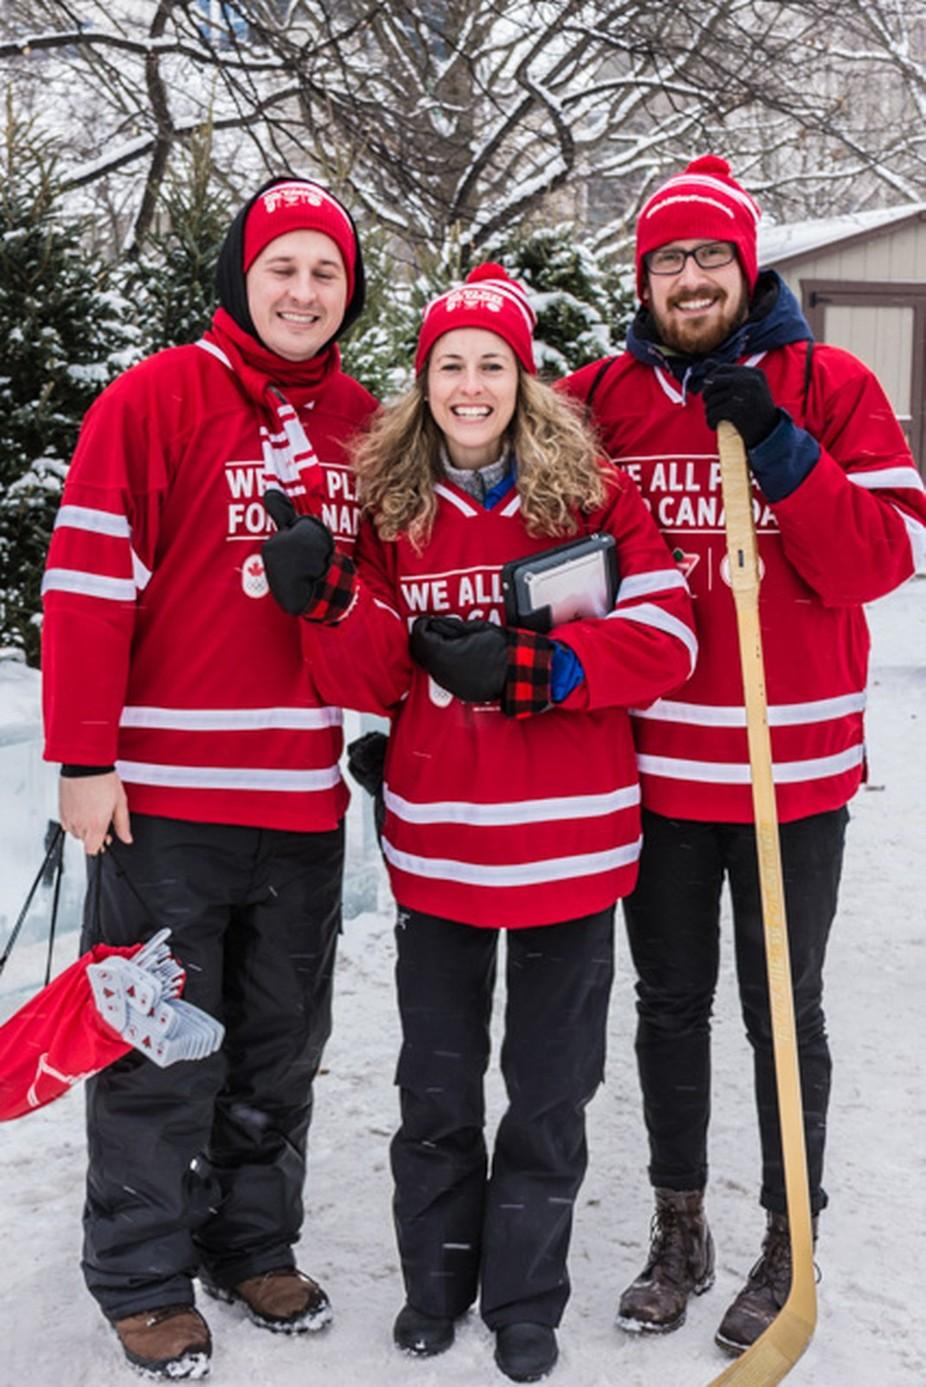 Ambassadors promoting hockey. Canada's sport.